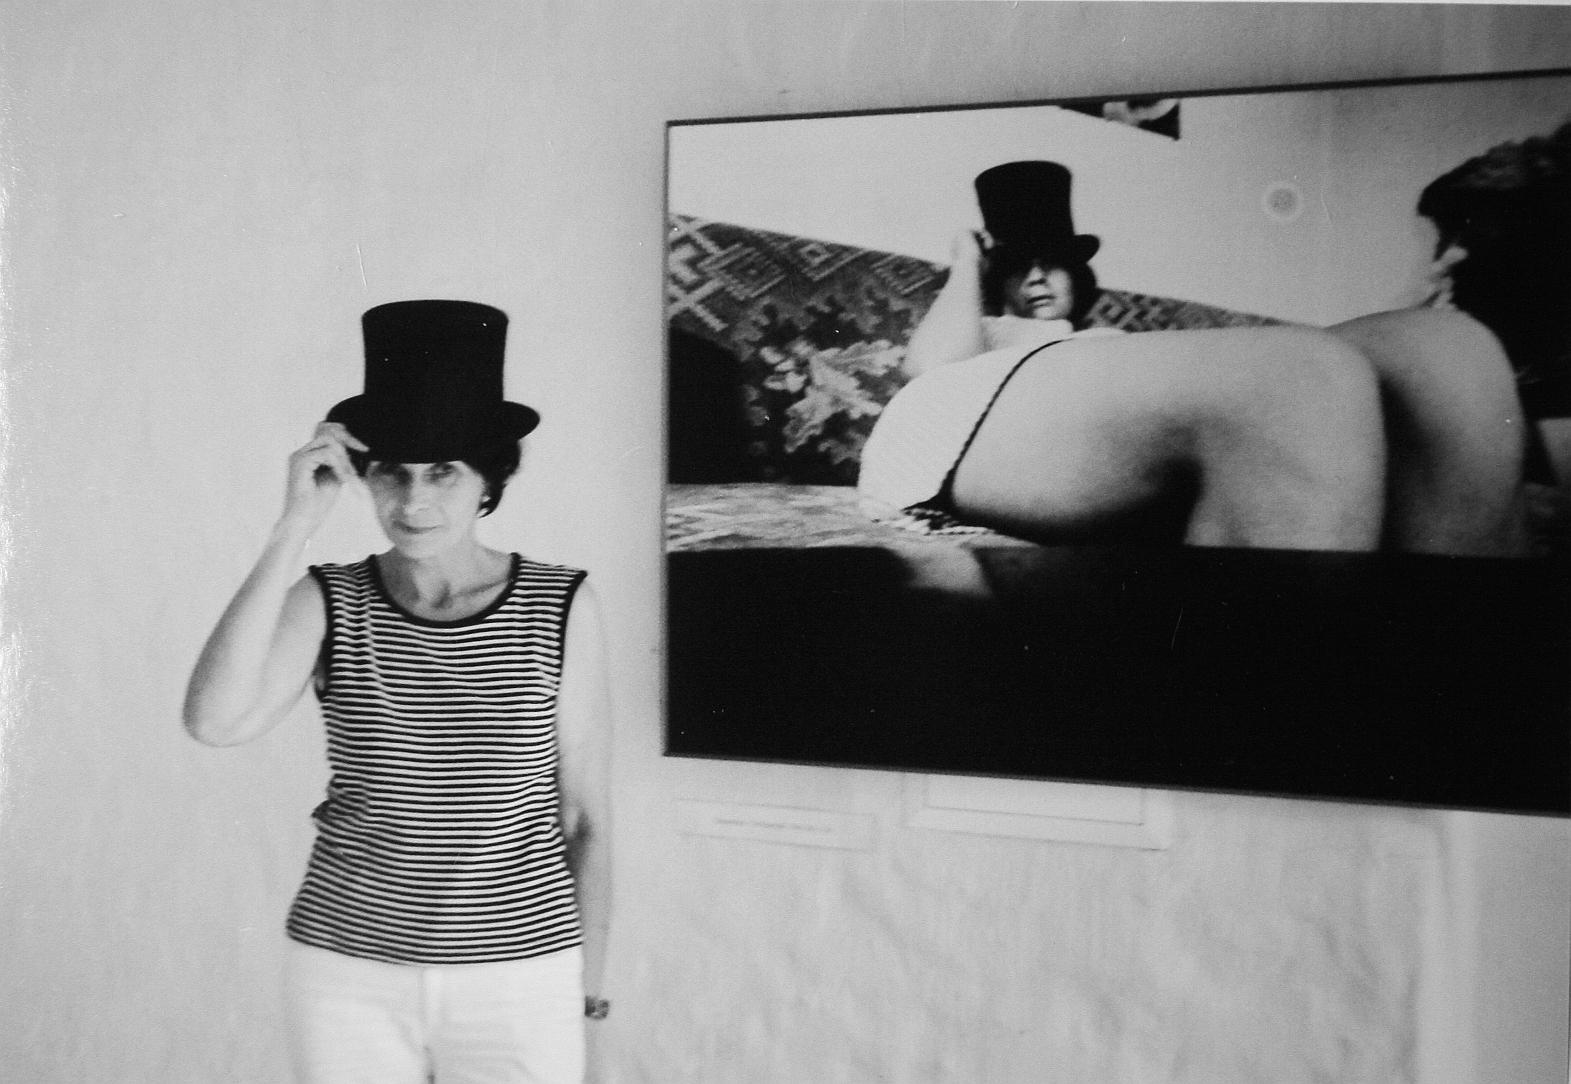 Zenta Dzividzinska  (1944-2011) in her solo exhibition in gallery  Ciris,  Riga, 1999, posing in front of her  Self-portrait,  1968 (gelatin silver print, printed in 1999, 90 x 130 cm).